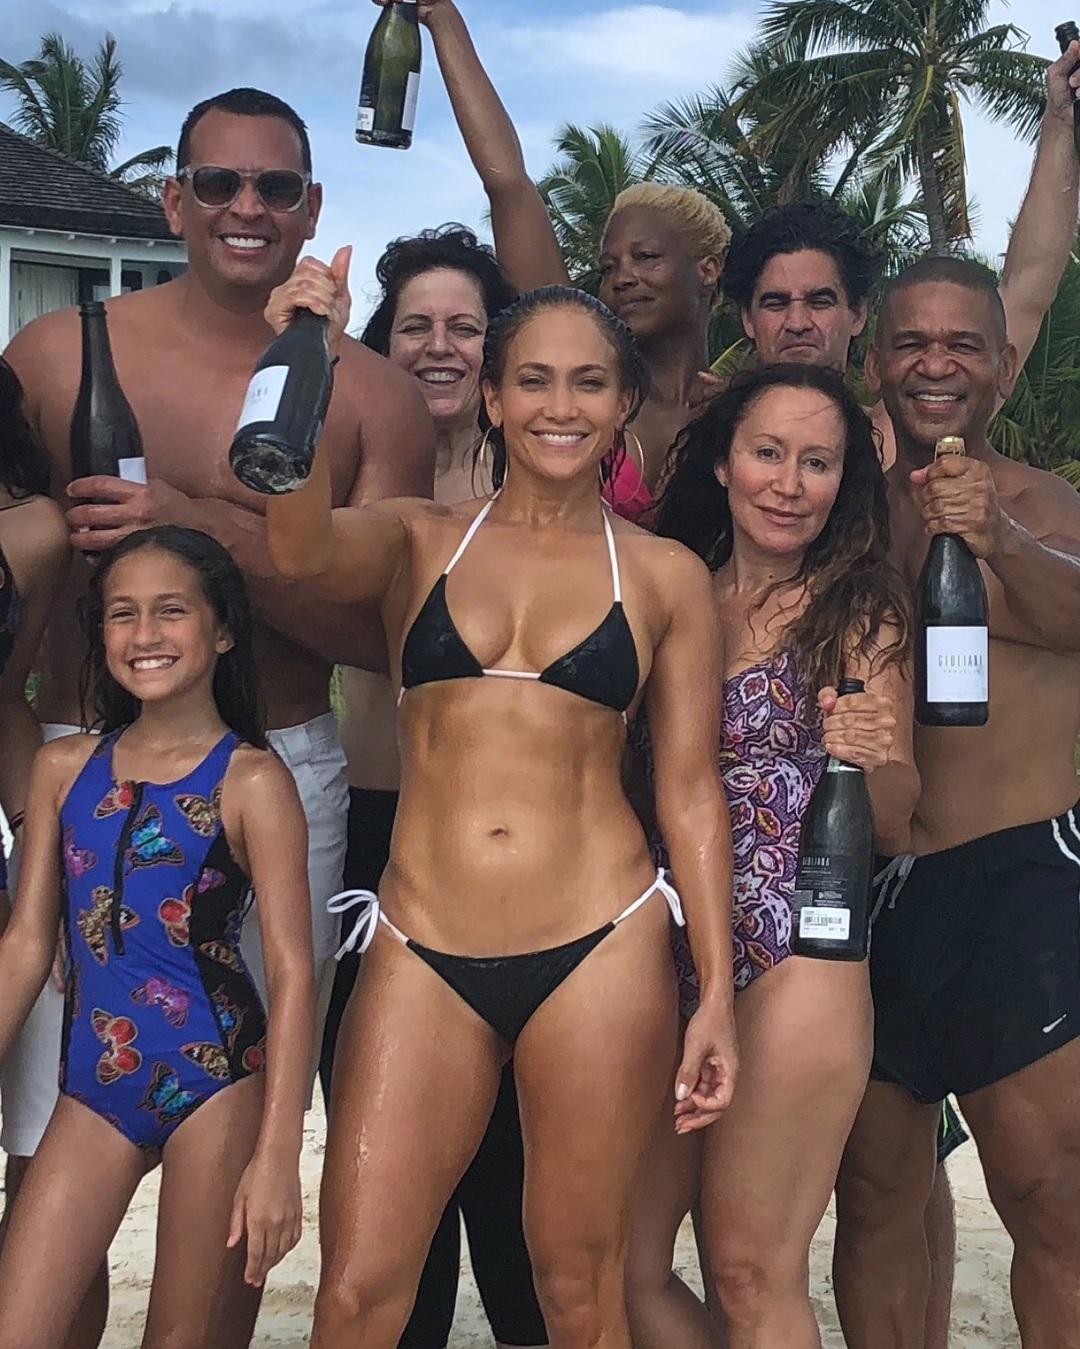 J-Lo si to na Bahamách s rodinkou a kamarády užila.